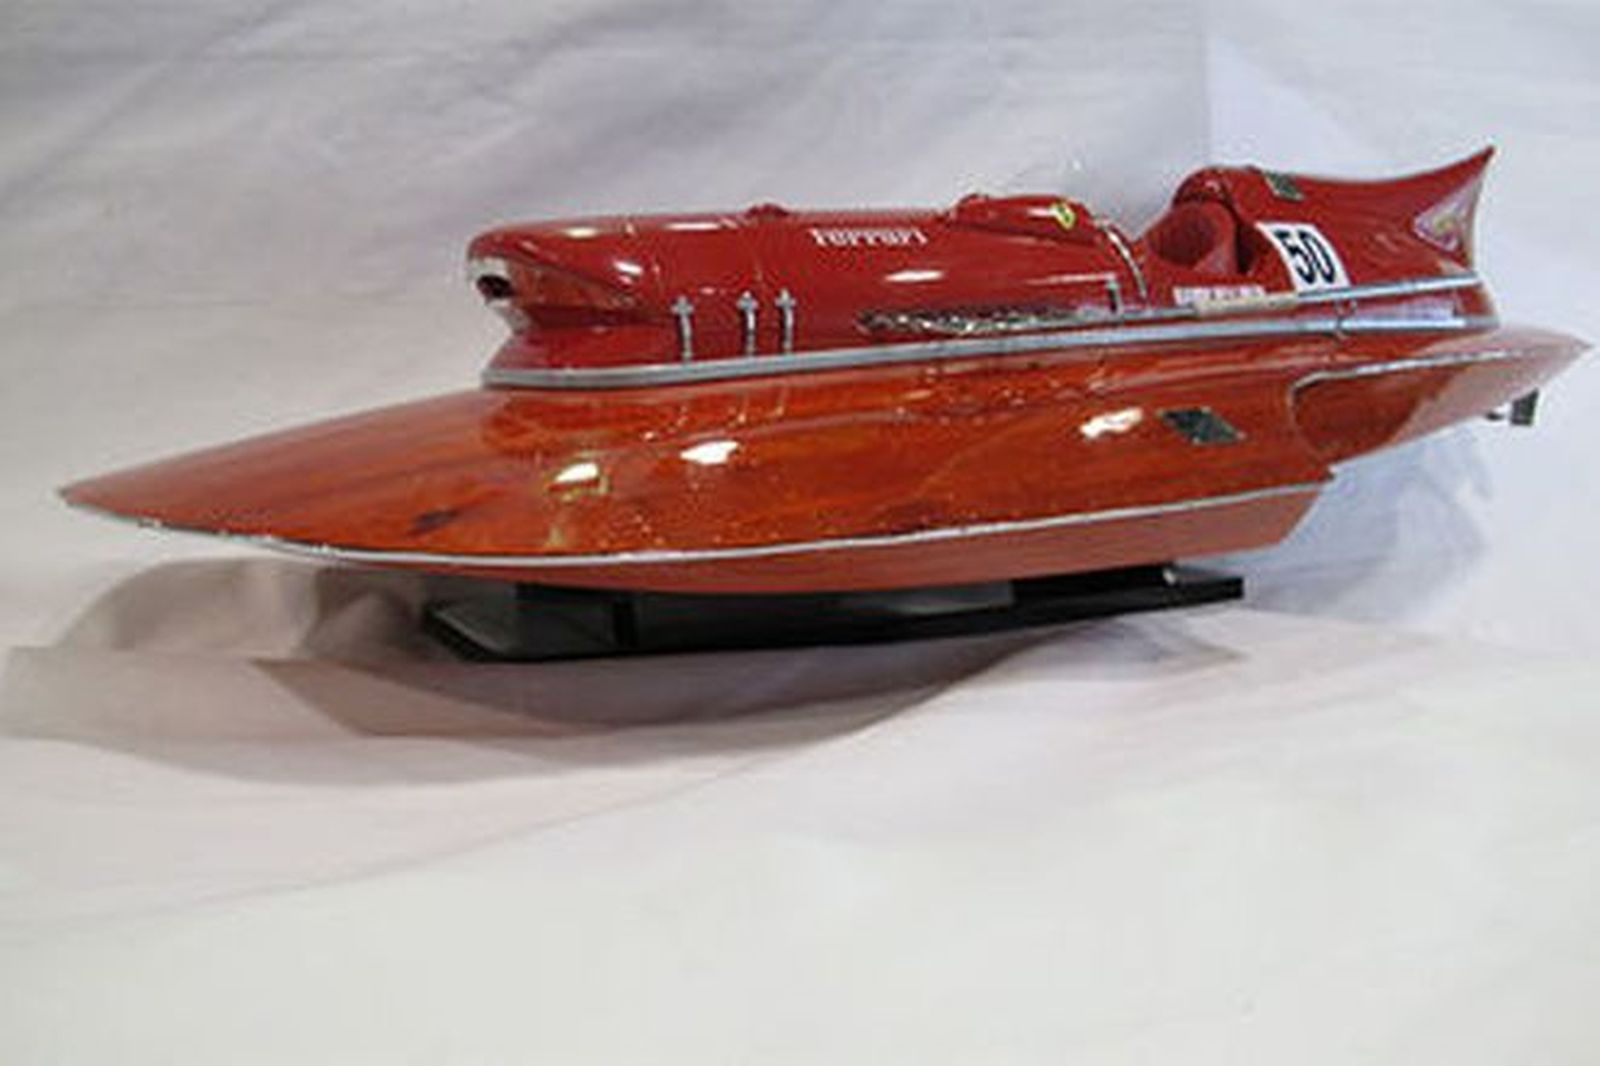 Model Boat - Ferrari Hydroplane (90cm Long)